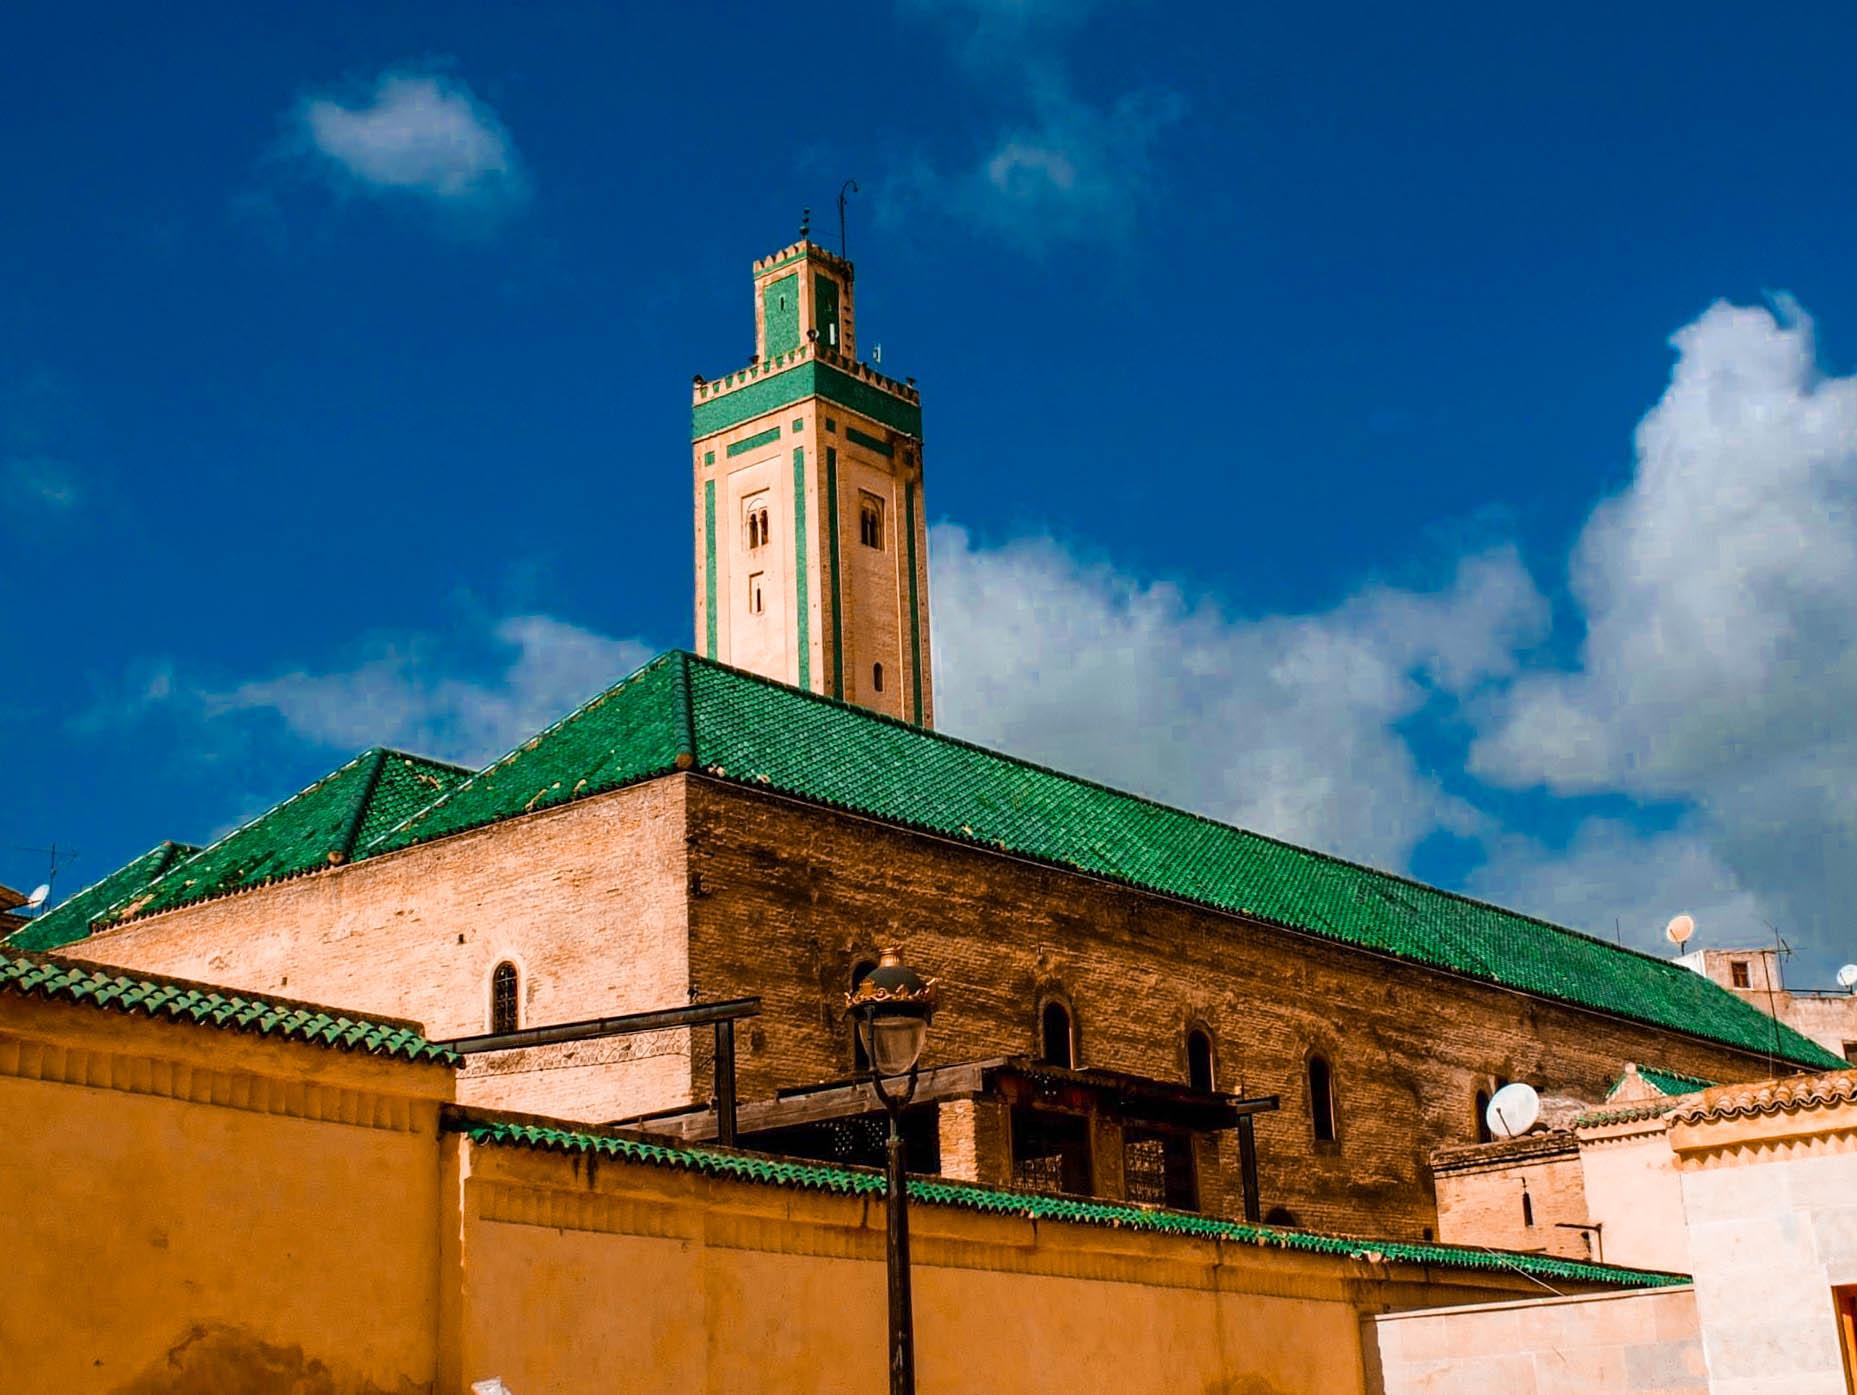 morocco itinerary, morocco 7 day itinerary, morocco road trip itinerary, morocco travel itinerary